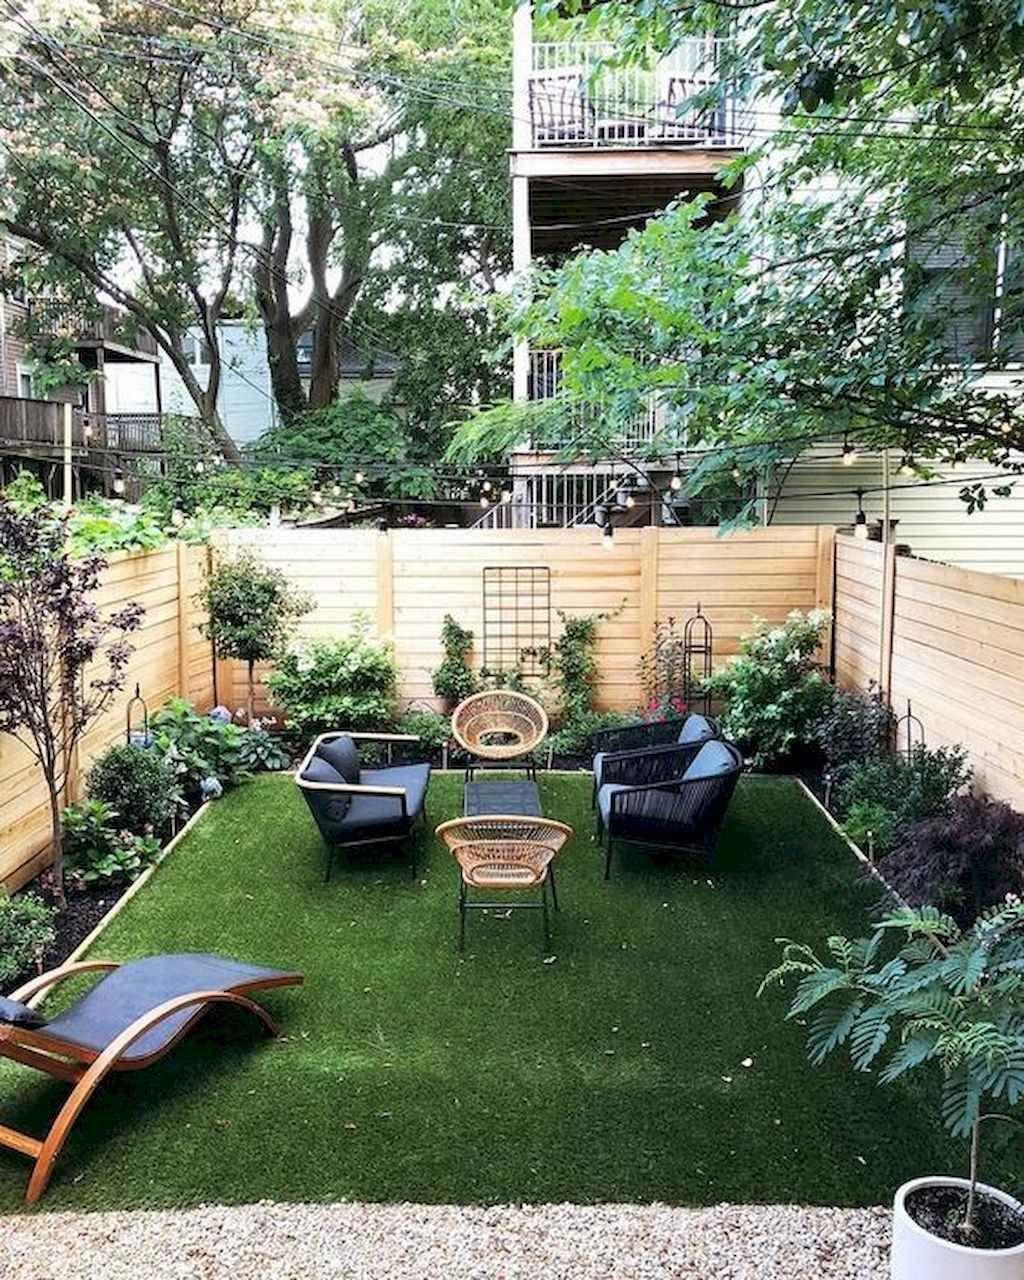 65 Amazing Backyard Garden Landscaping And Design Ideas Backyard